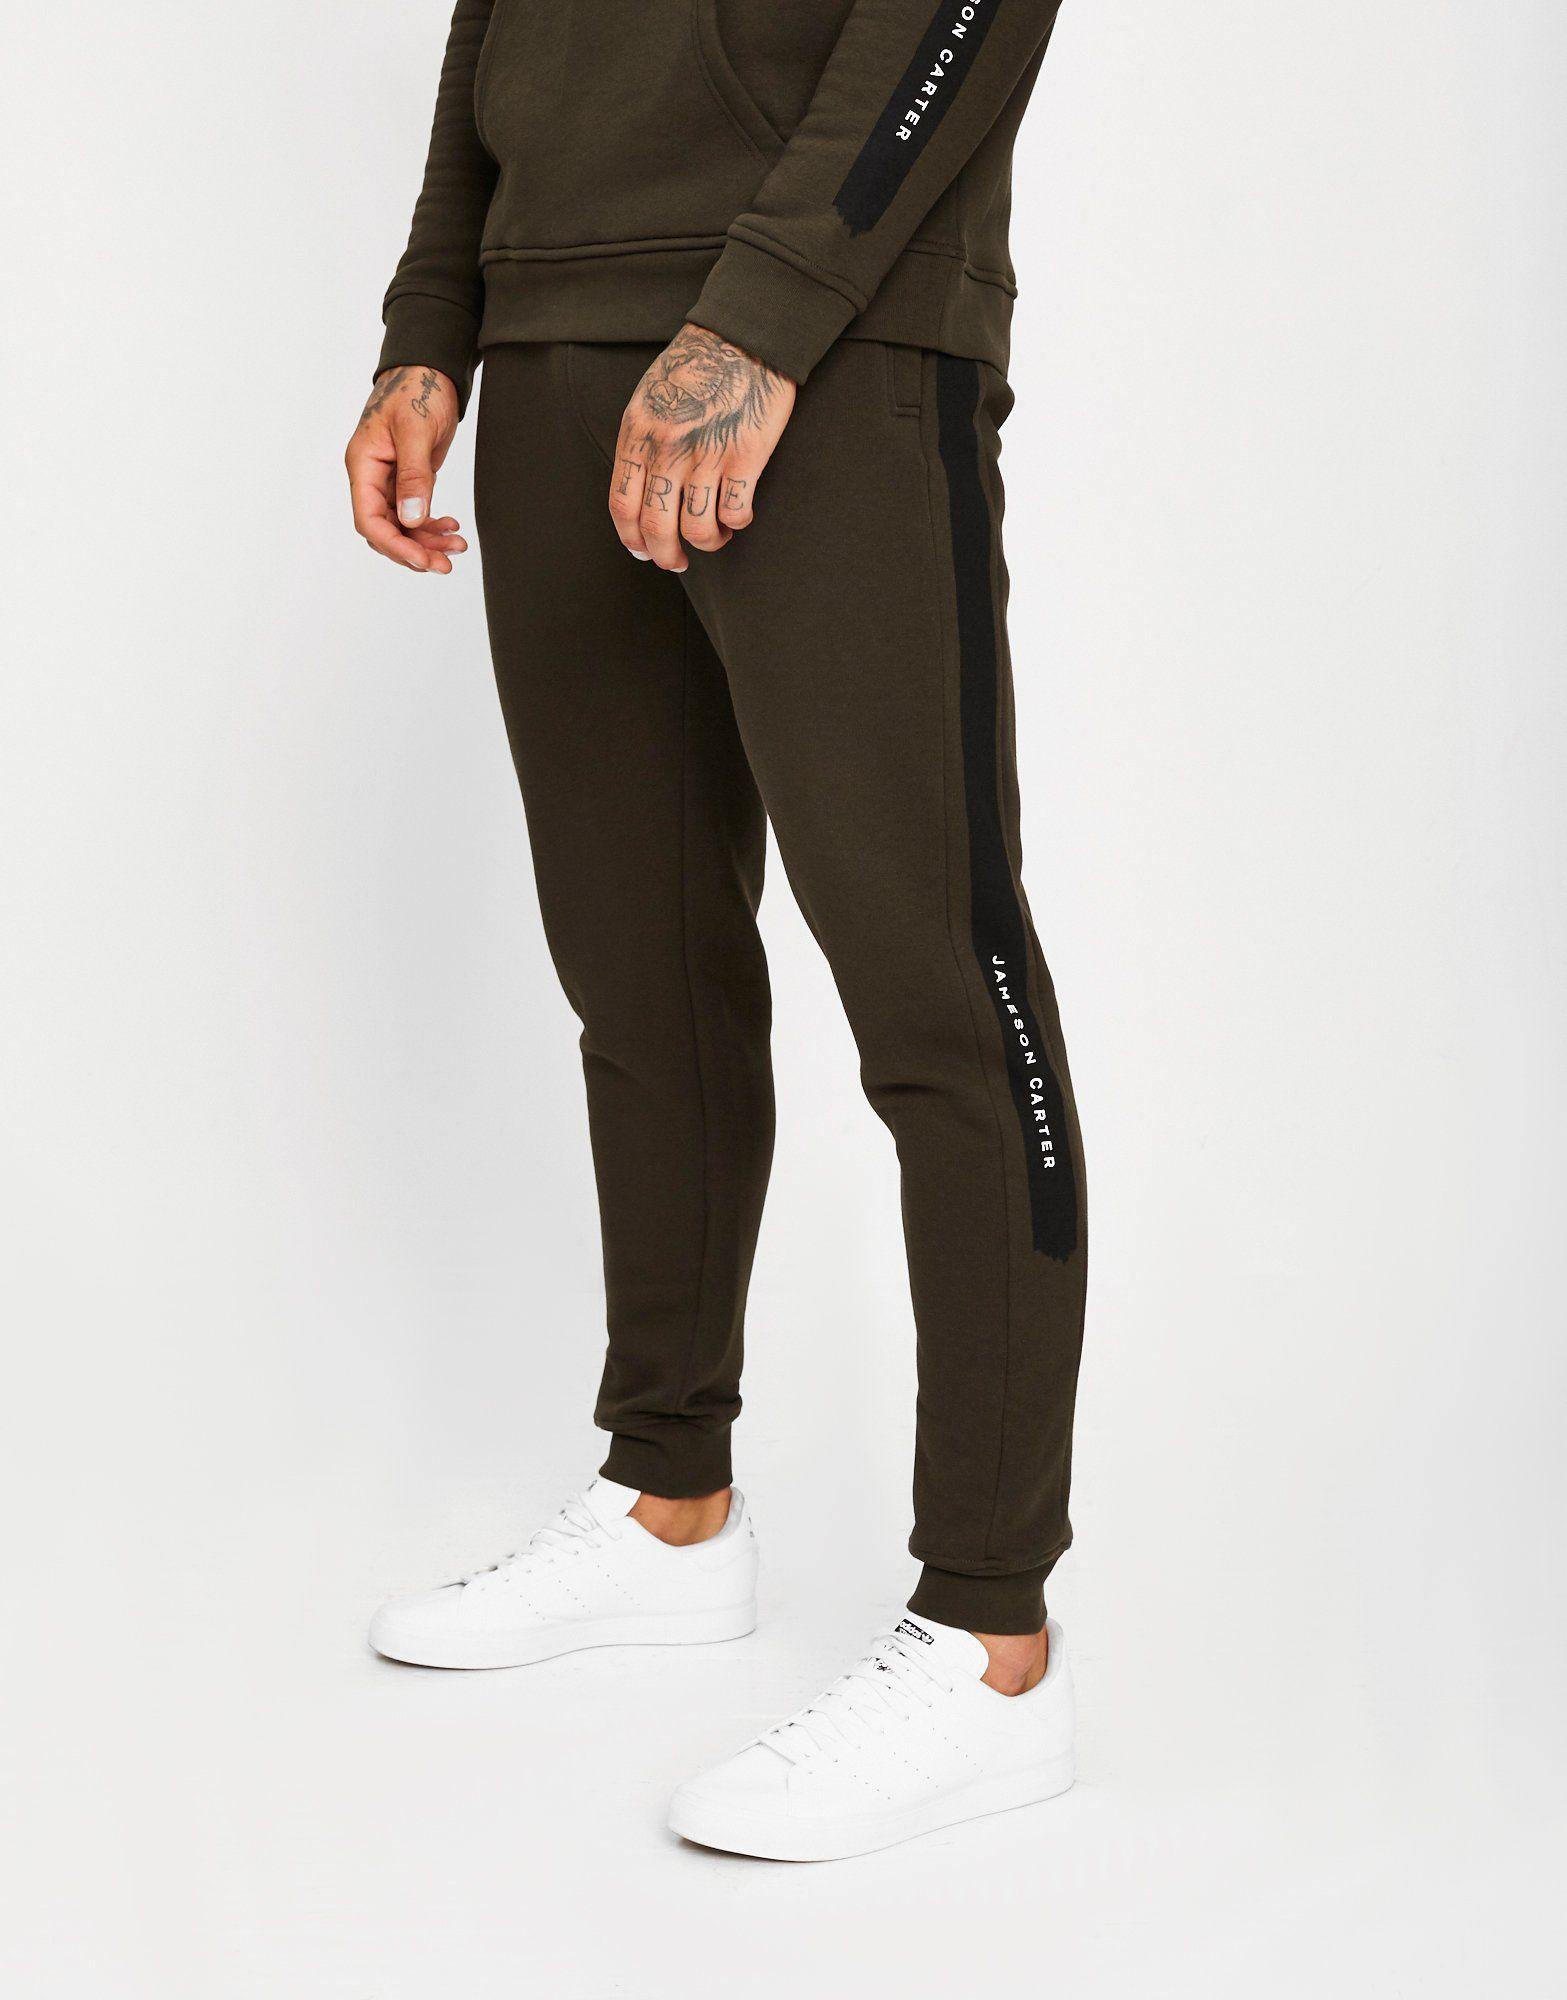 JAMESON CARTER pantalón de chándal Paint Stripe